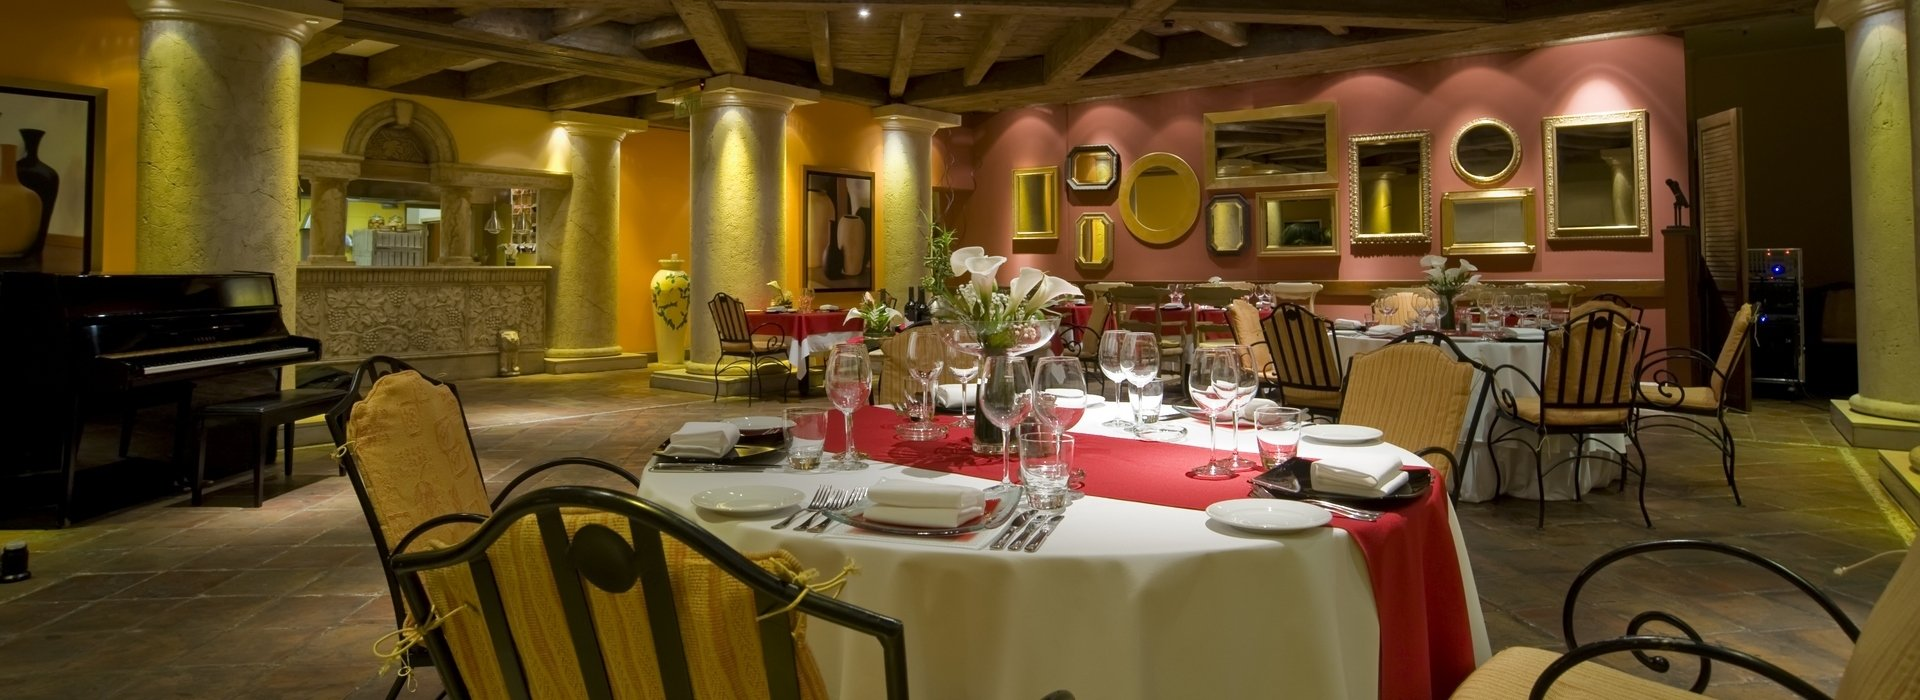 Restaurants in Buda